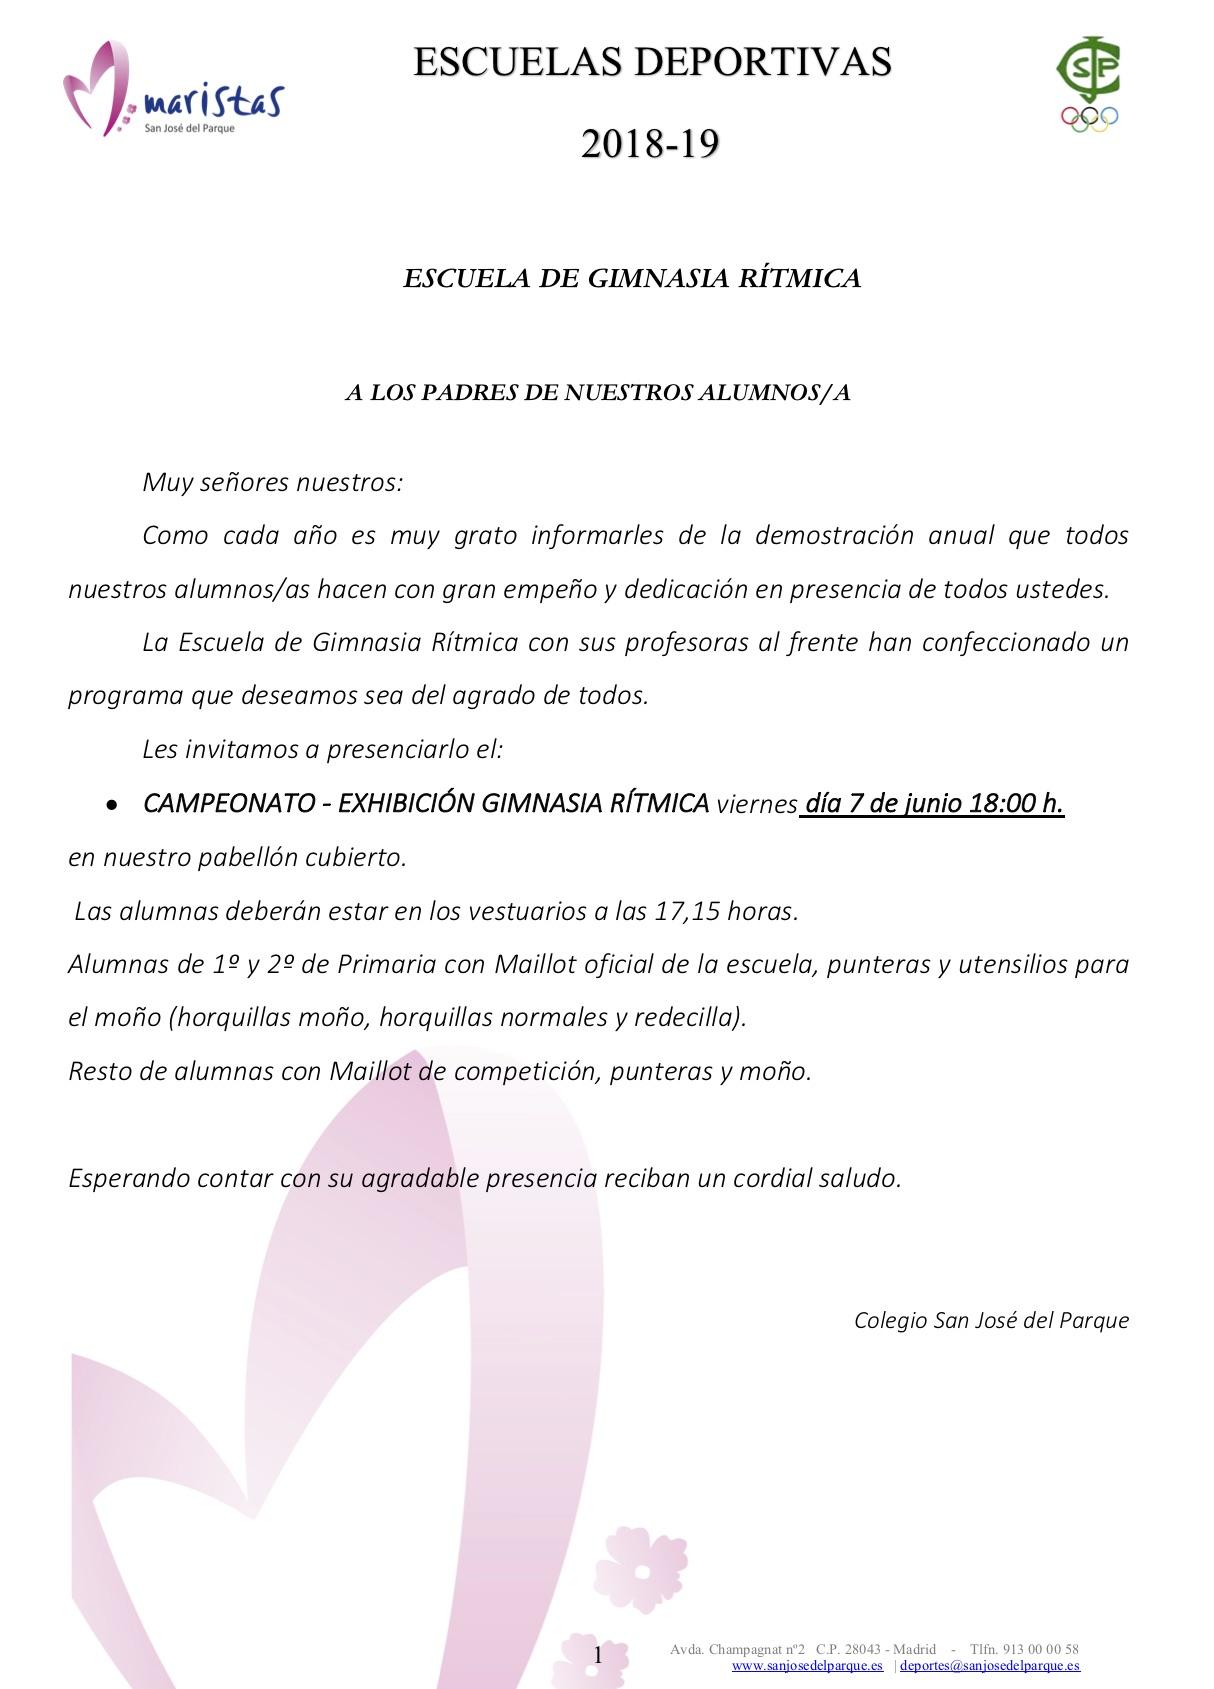 Campeonato Gimnasia Rítmica @ Colegio SJP